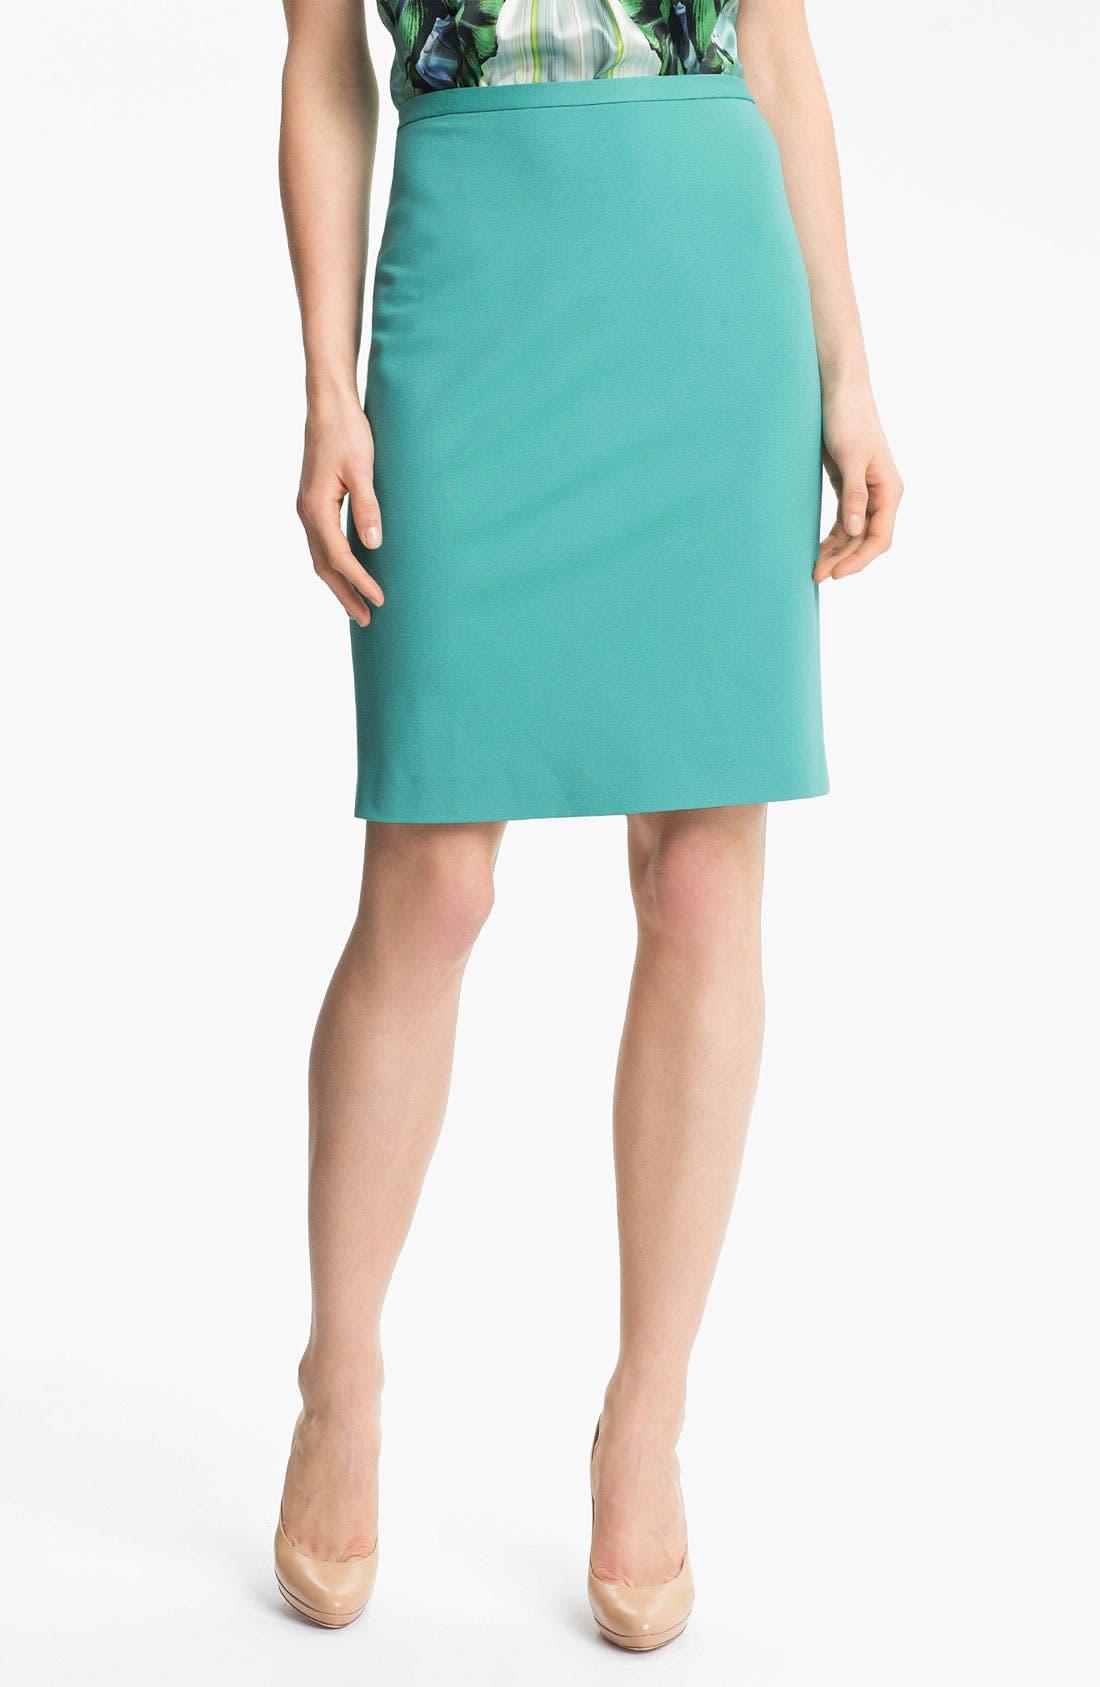 Alternate Image 1 Selected - Elie Tahari 'Kim' Jersey Skirt